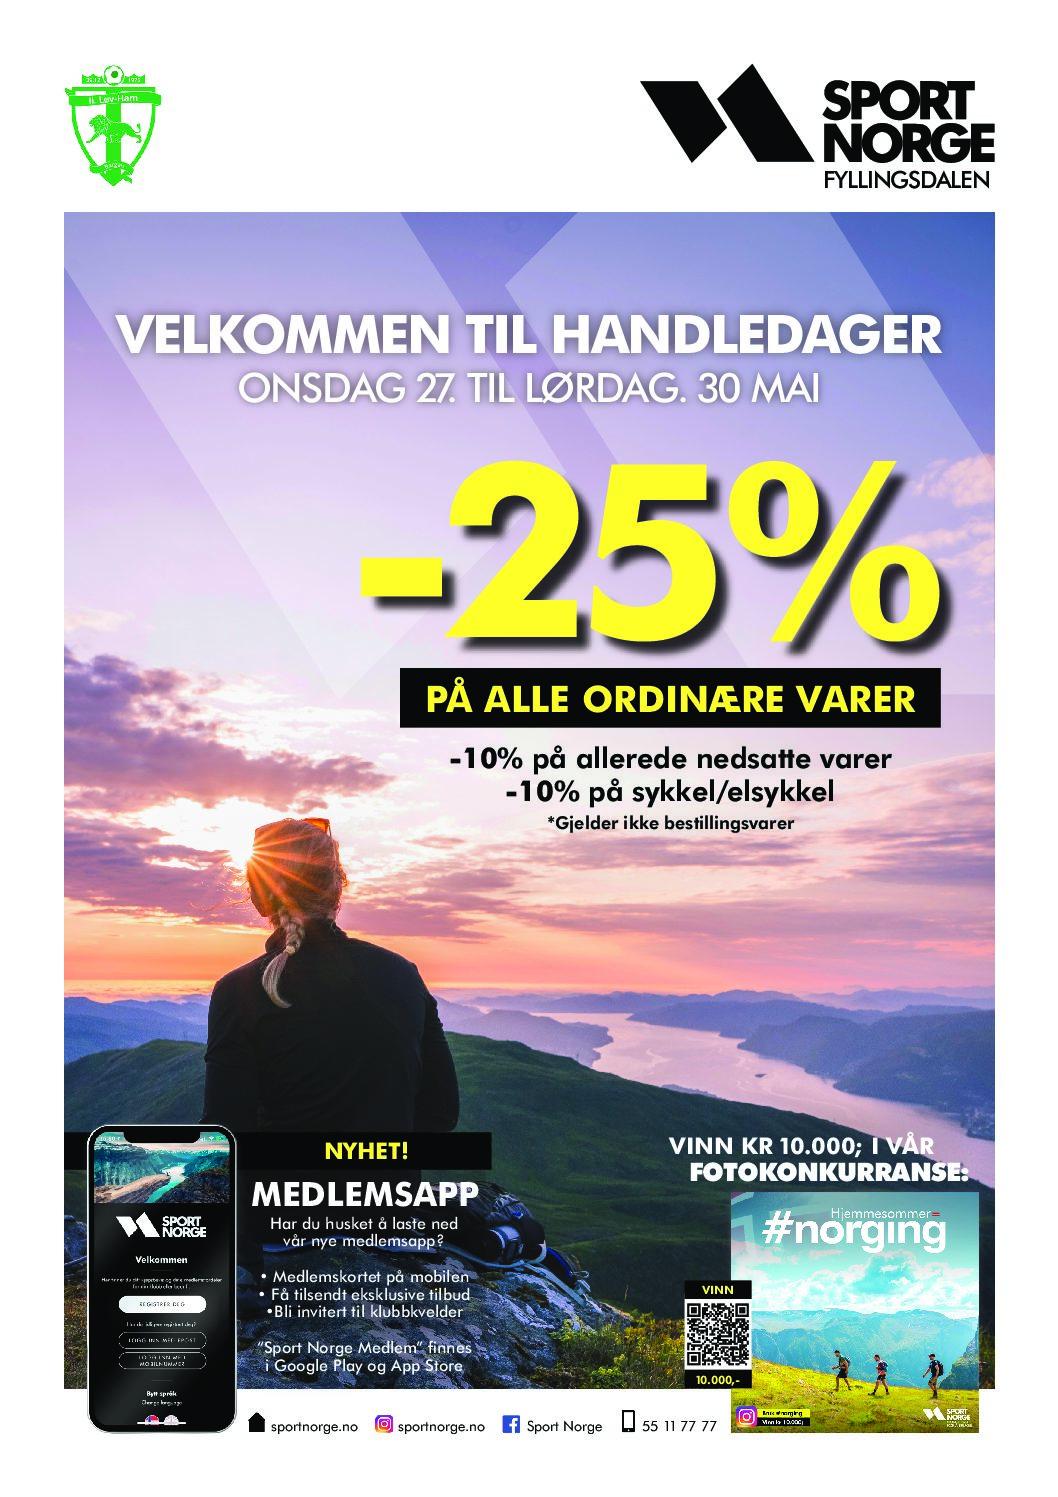 Velkommen til handledager hos Sport Norge